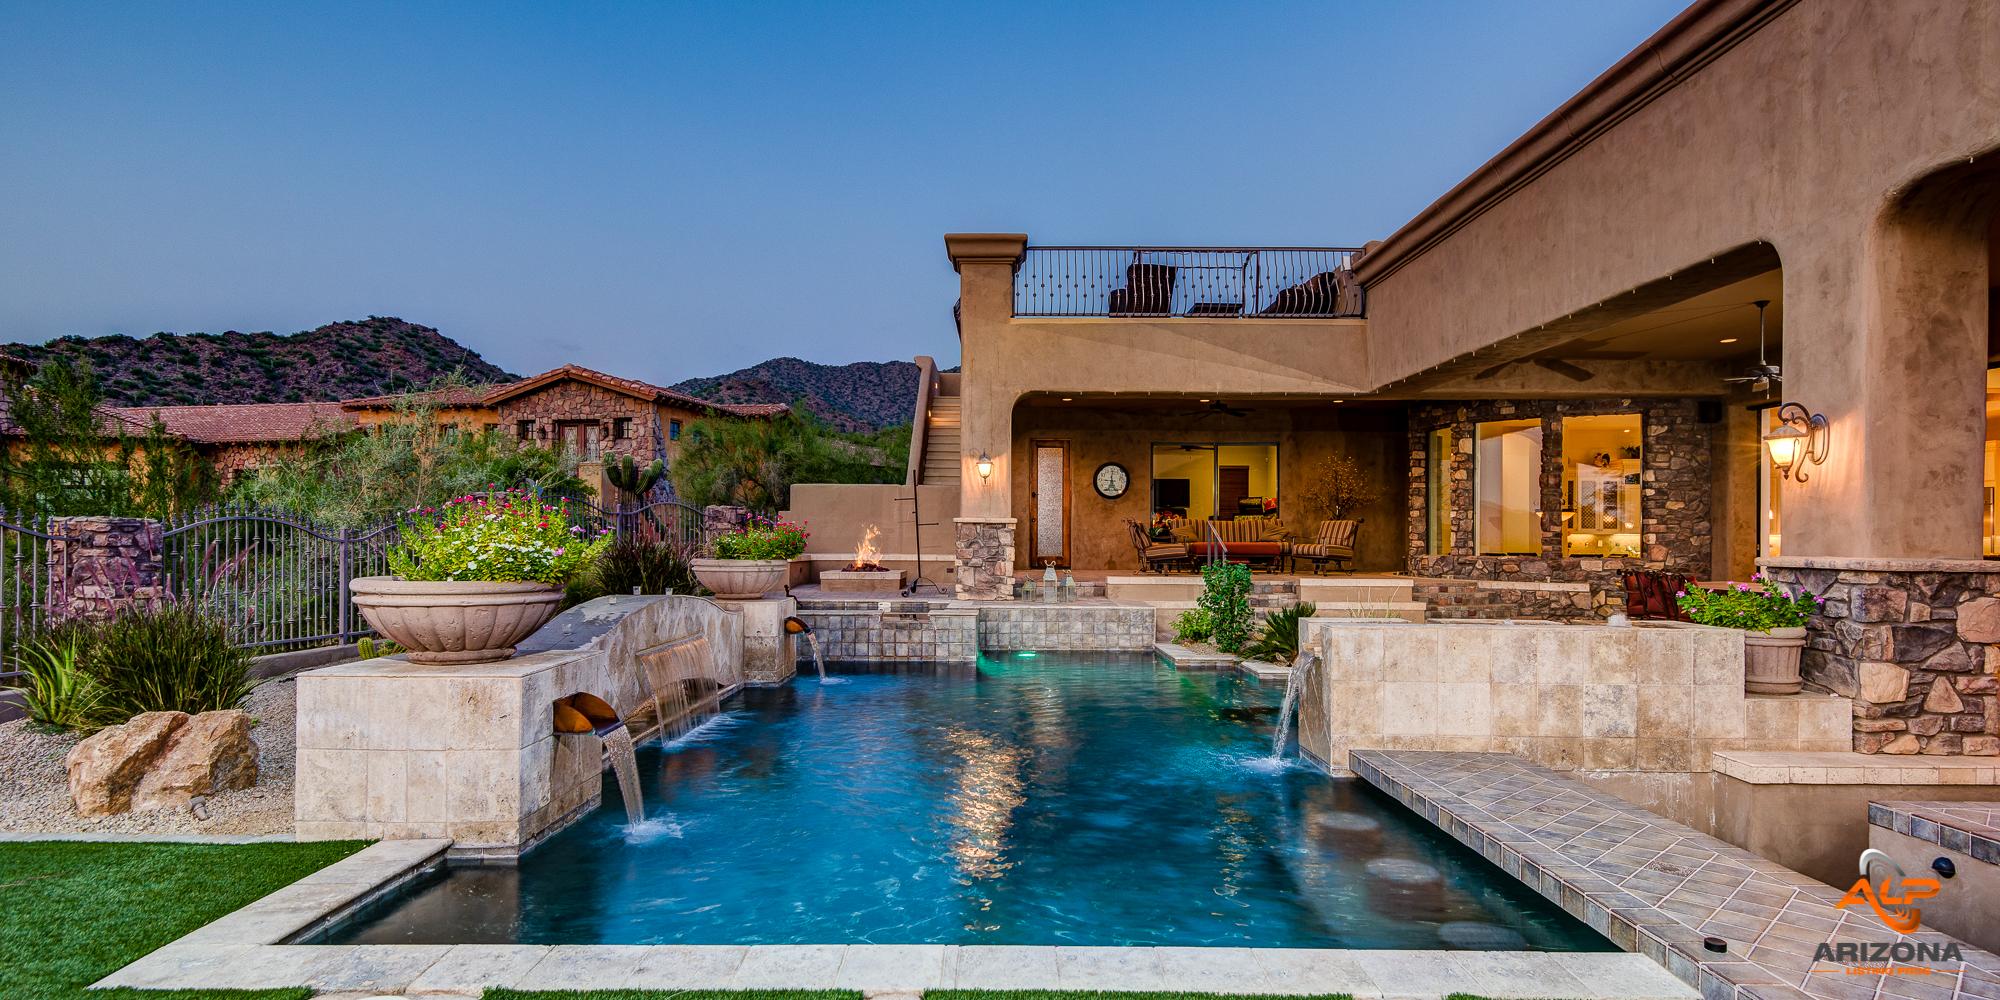 4323 North El Sereno Circle, Mesa, Arizona, My Home Group, DSC_9164, Arizona Listing Pros, Twighlight Photography, Luxury Real Estate Photography.jpg